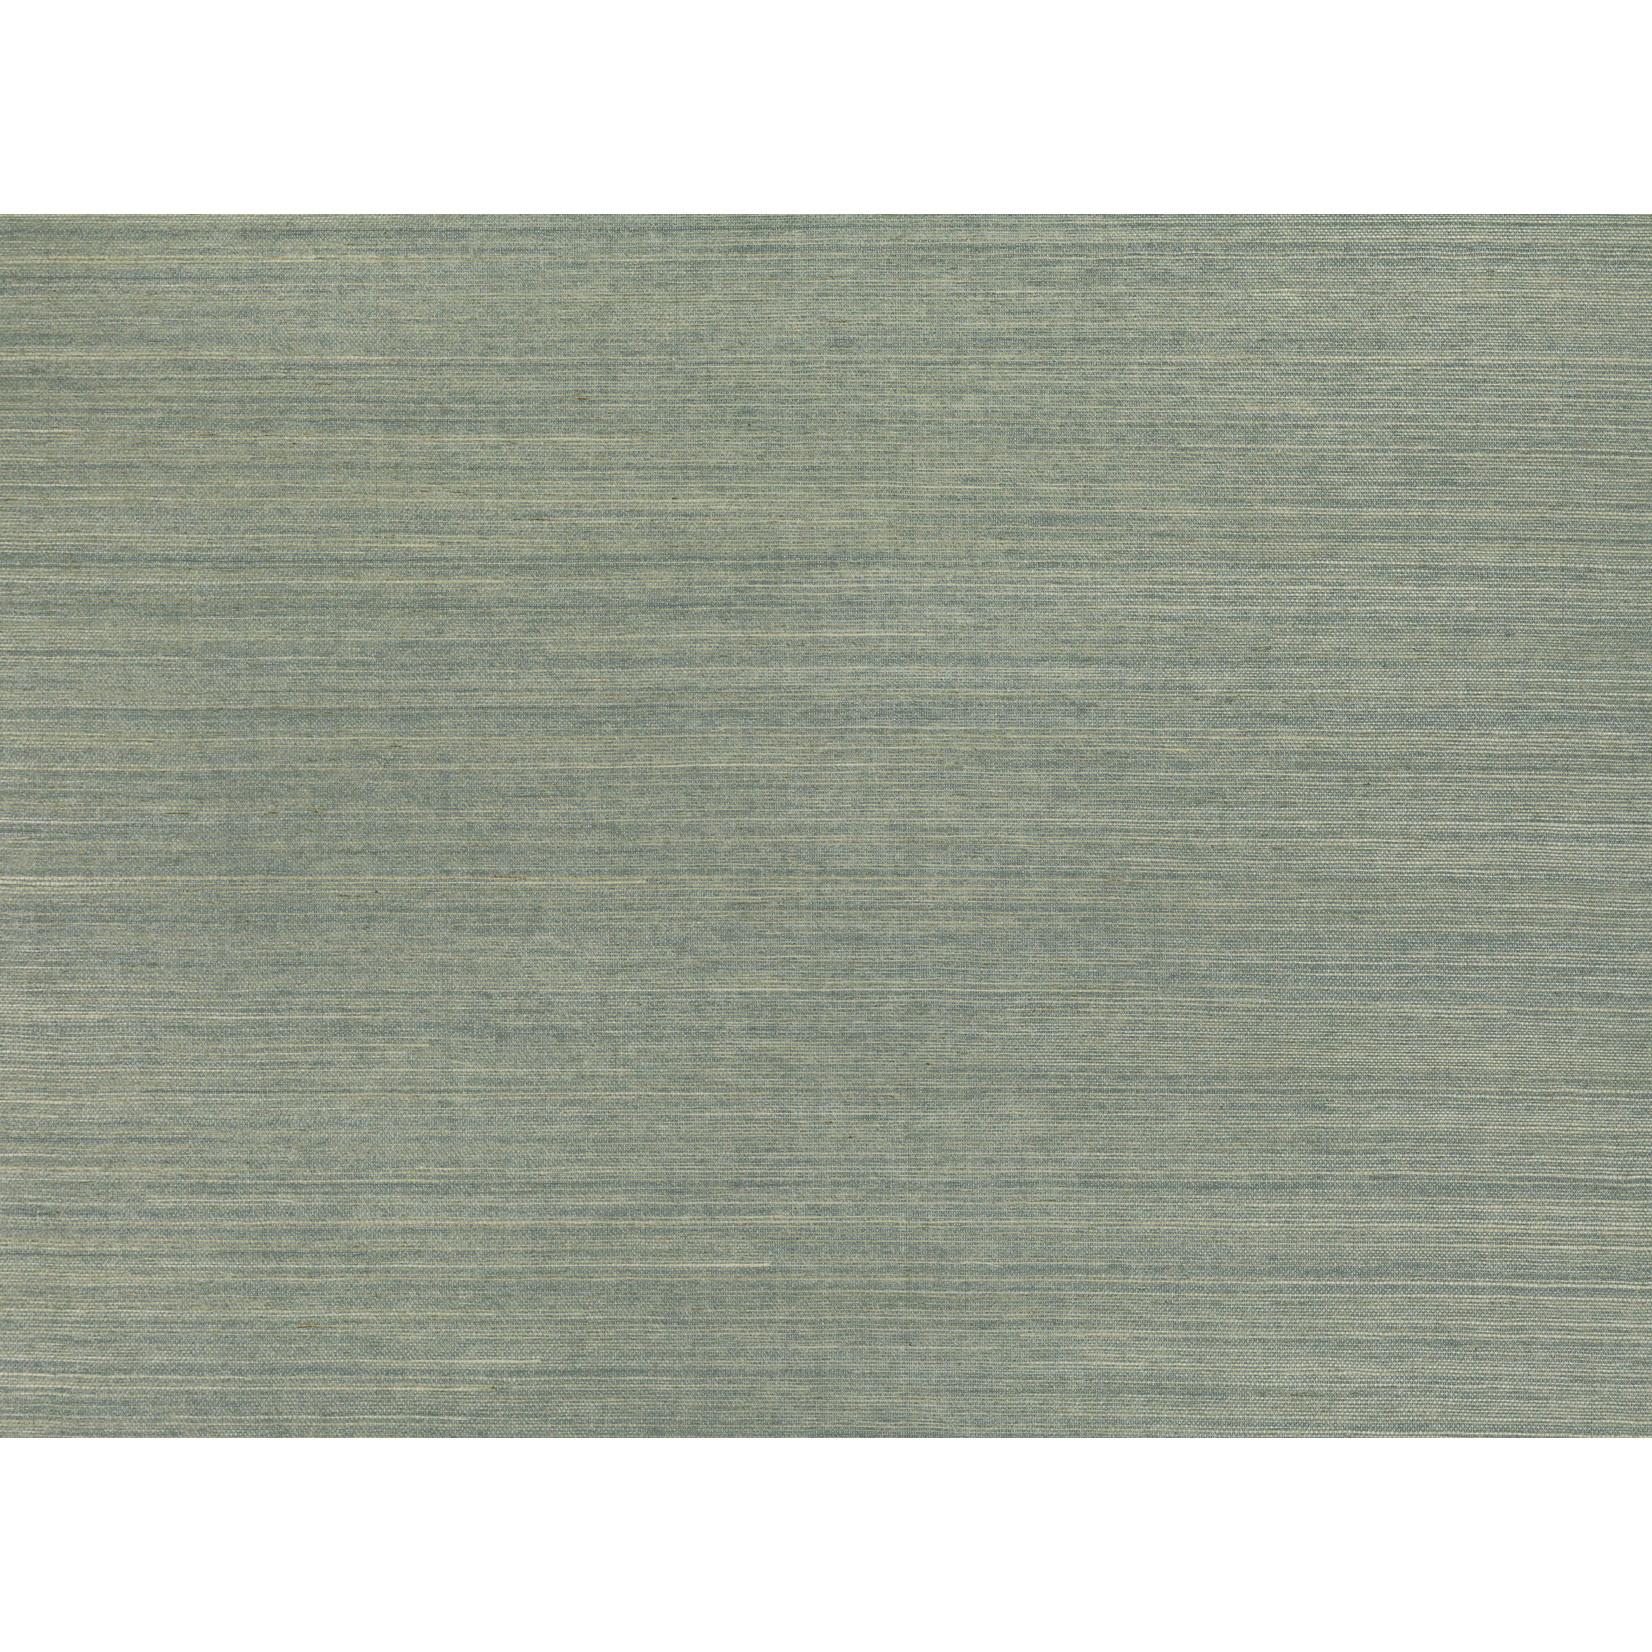 Mark Alexander Grasscloth Handwoven Wallcoverings | Sisal Tempest